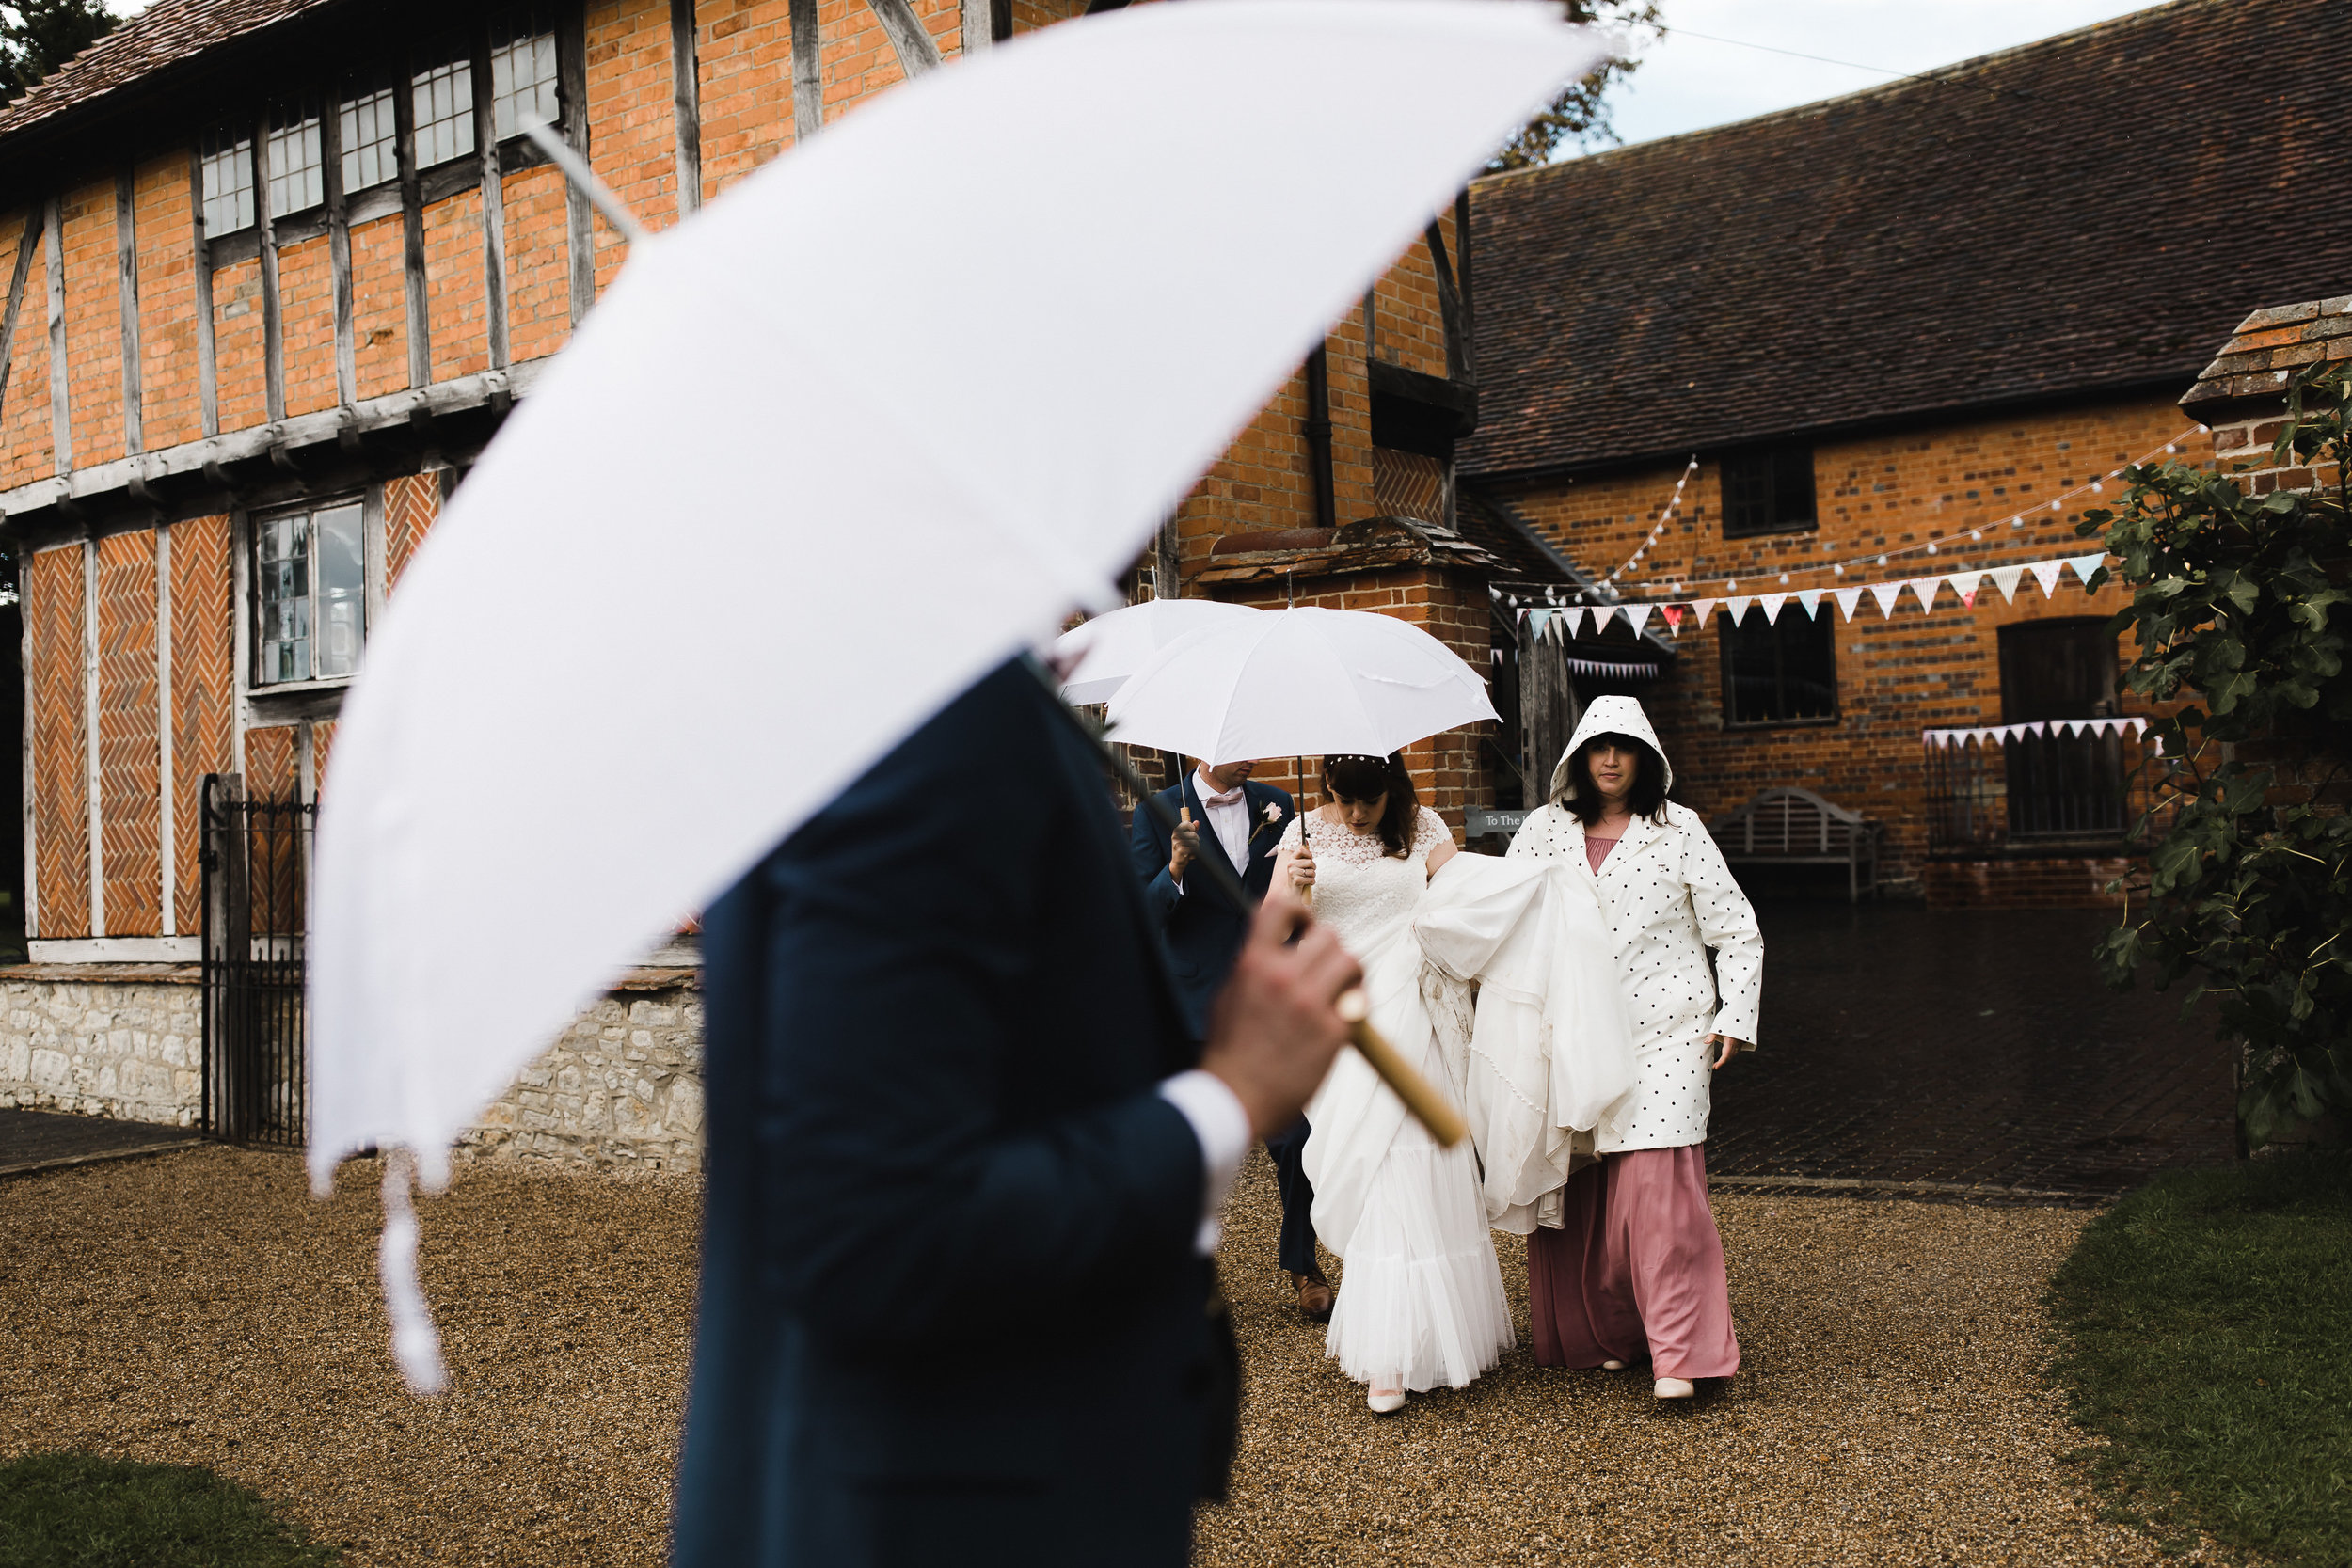 Nether_Wichendon_House_Wedding_050.jpg